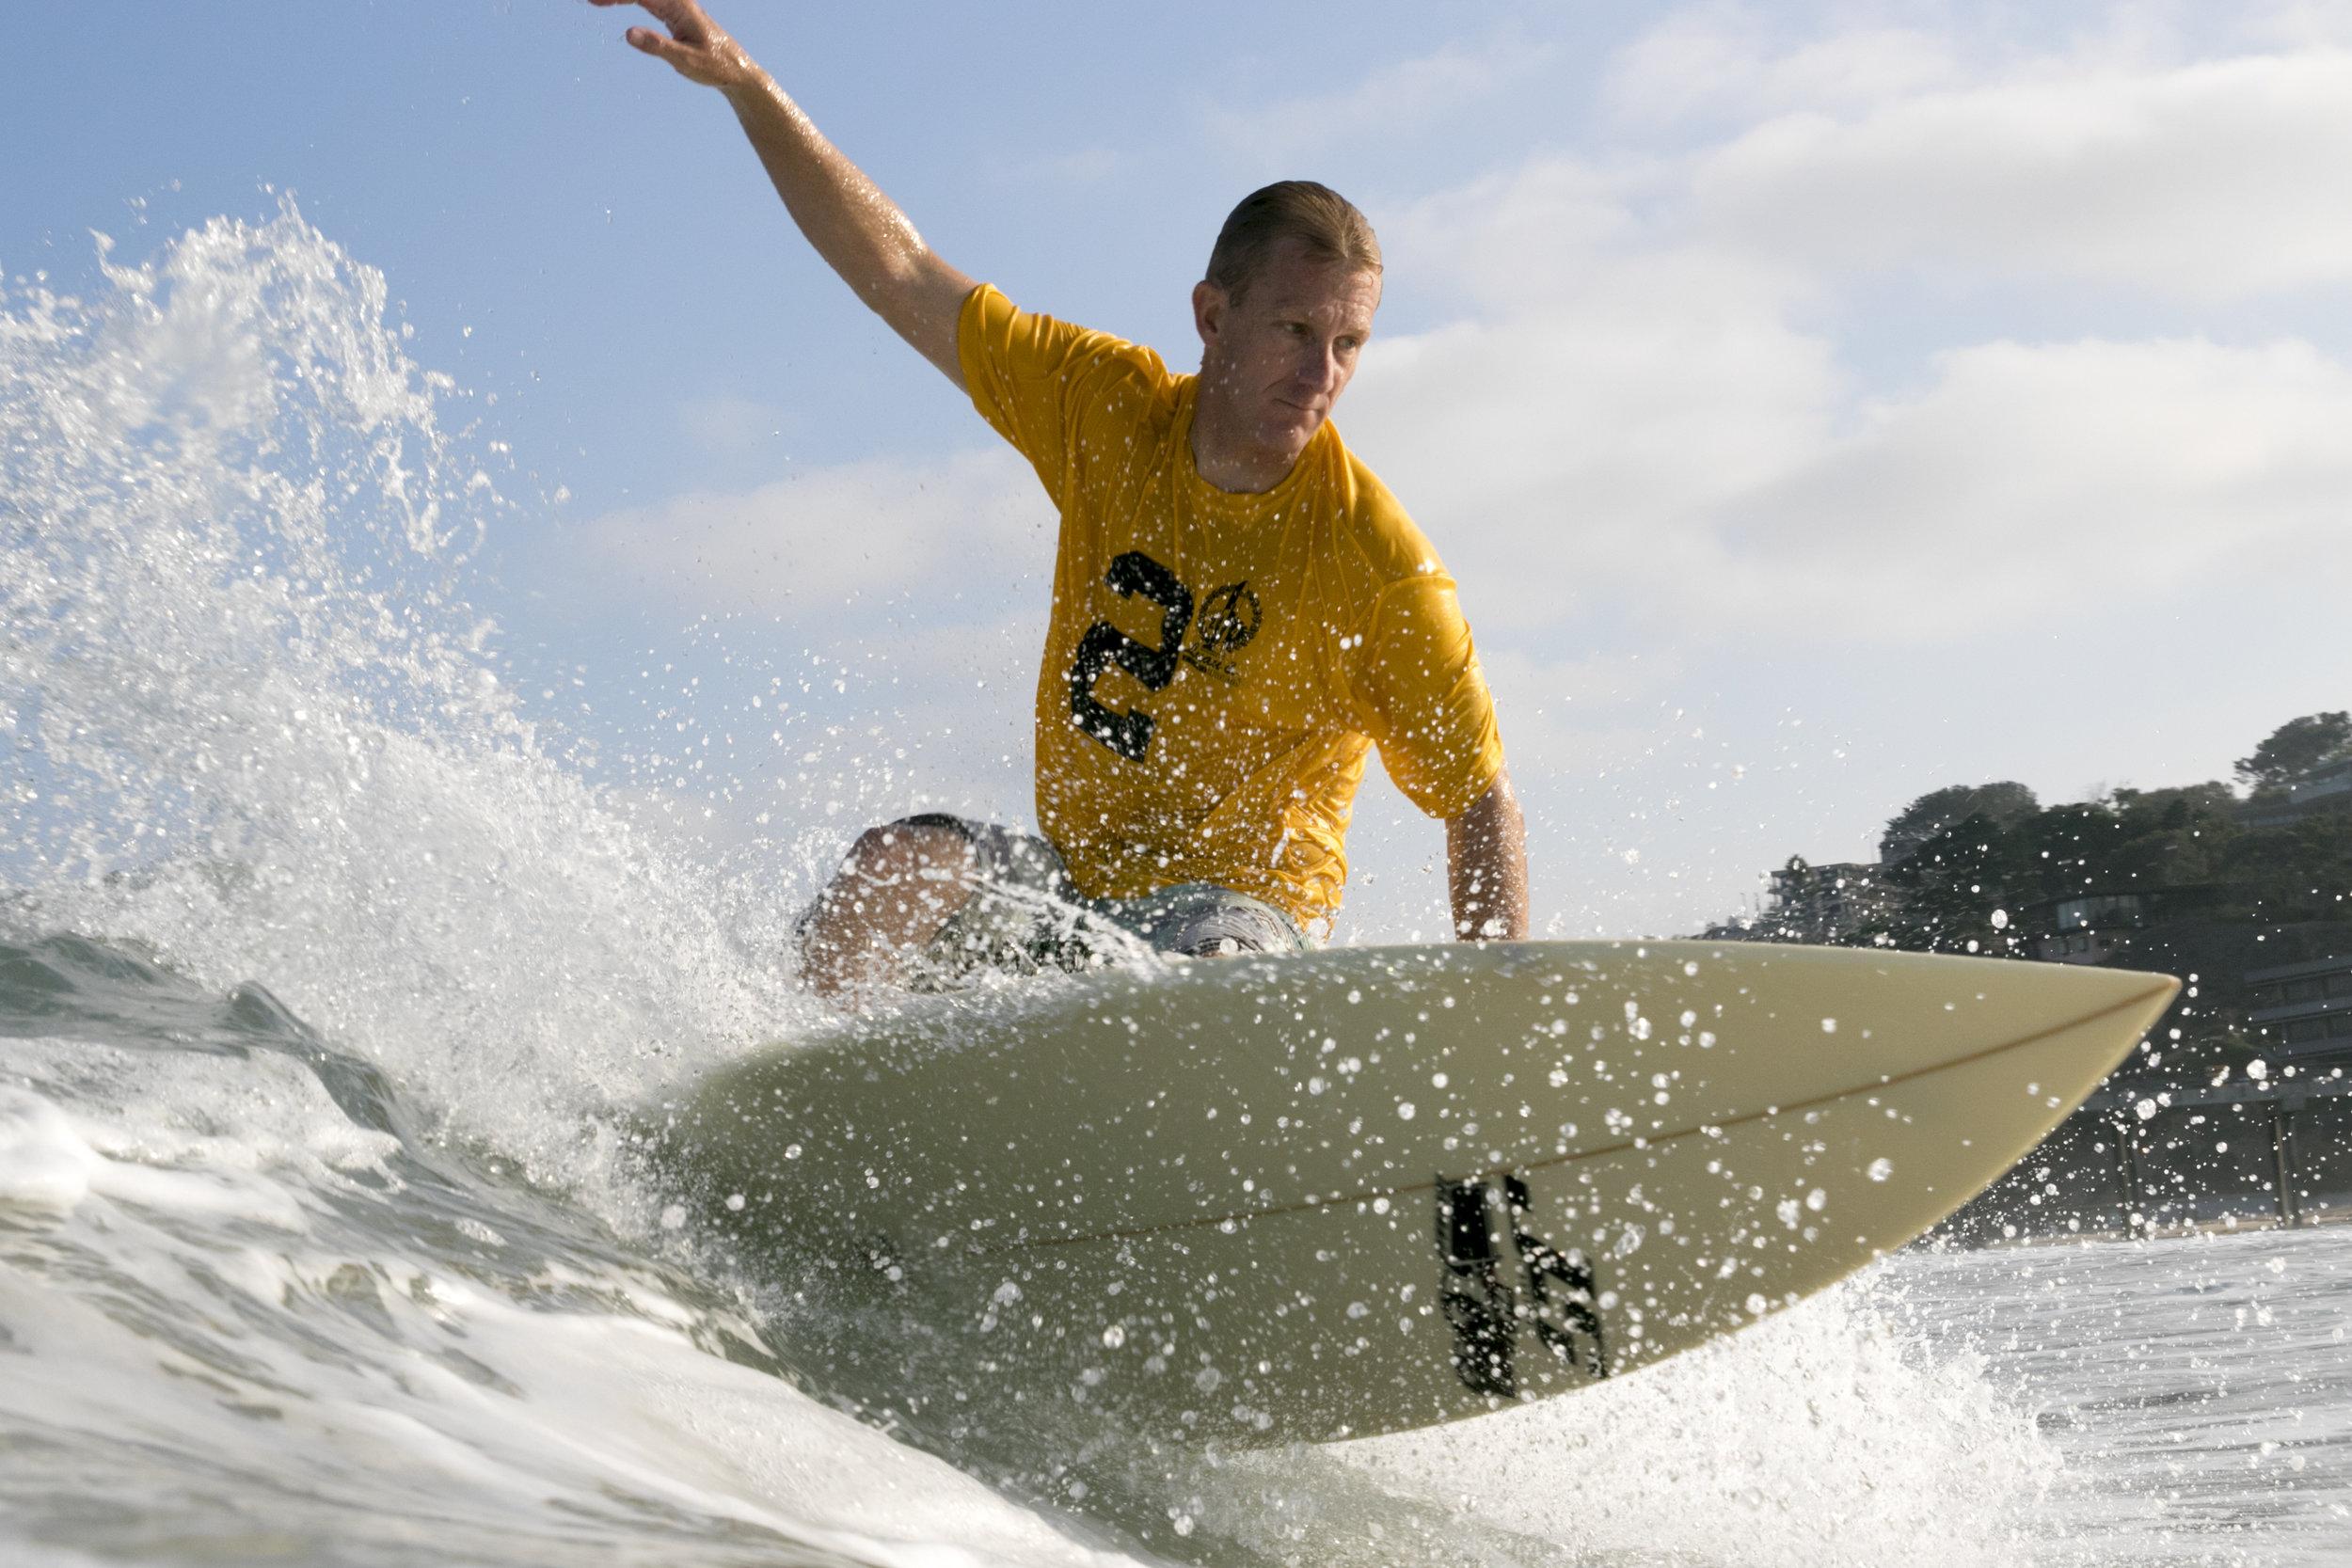 surfing-ucsd-luau-20180819-083edit-8x12.jpg